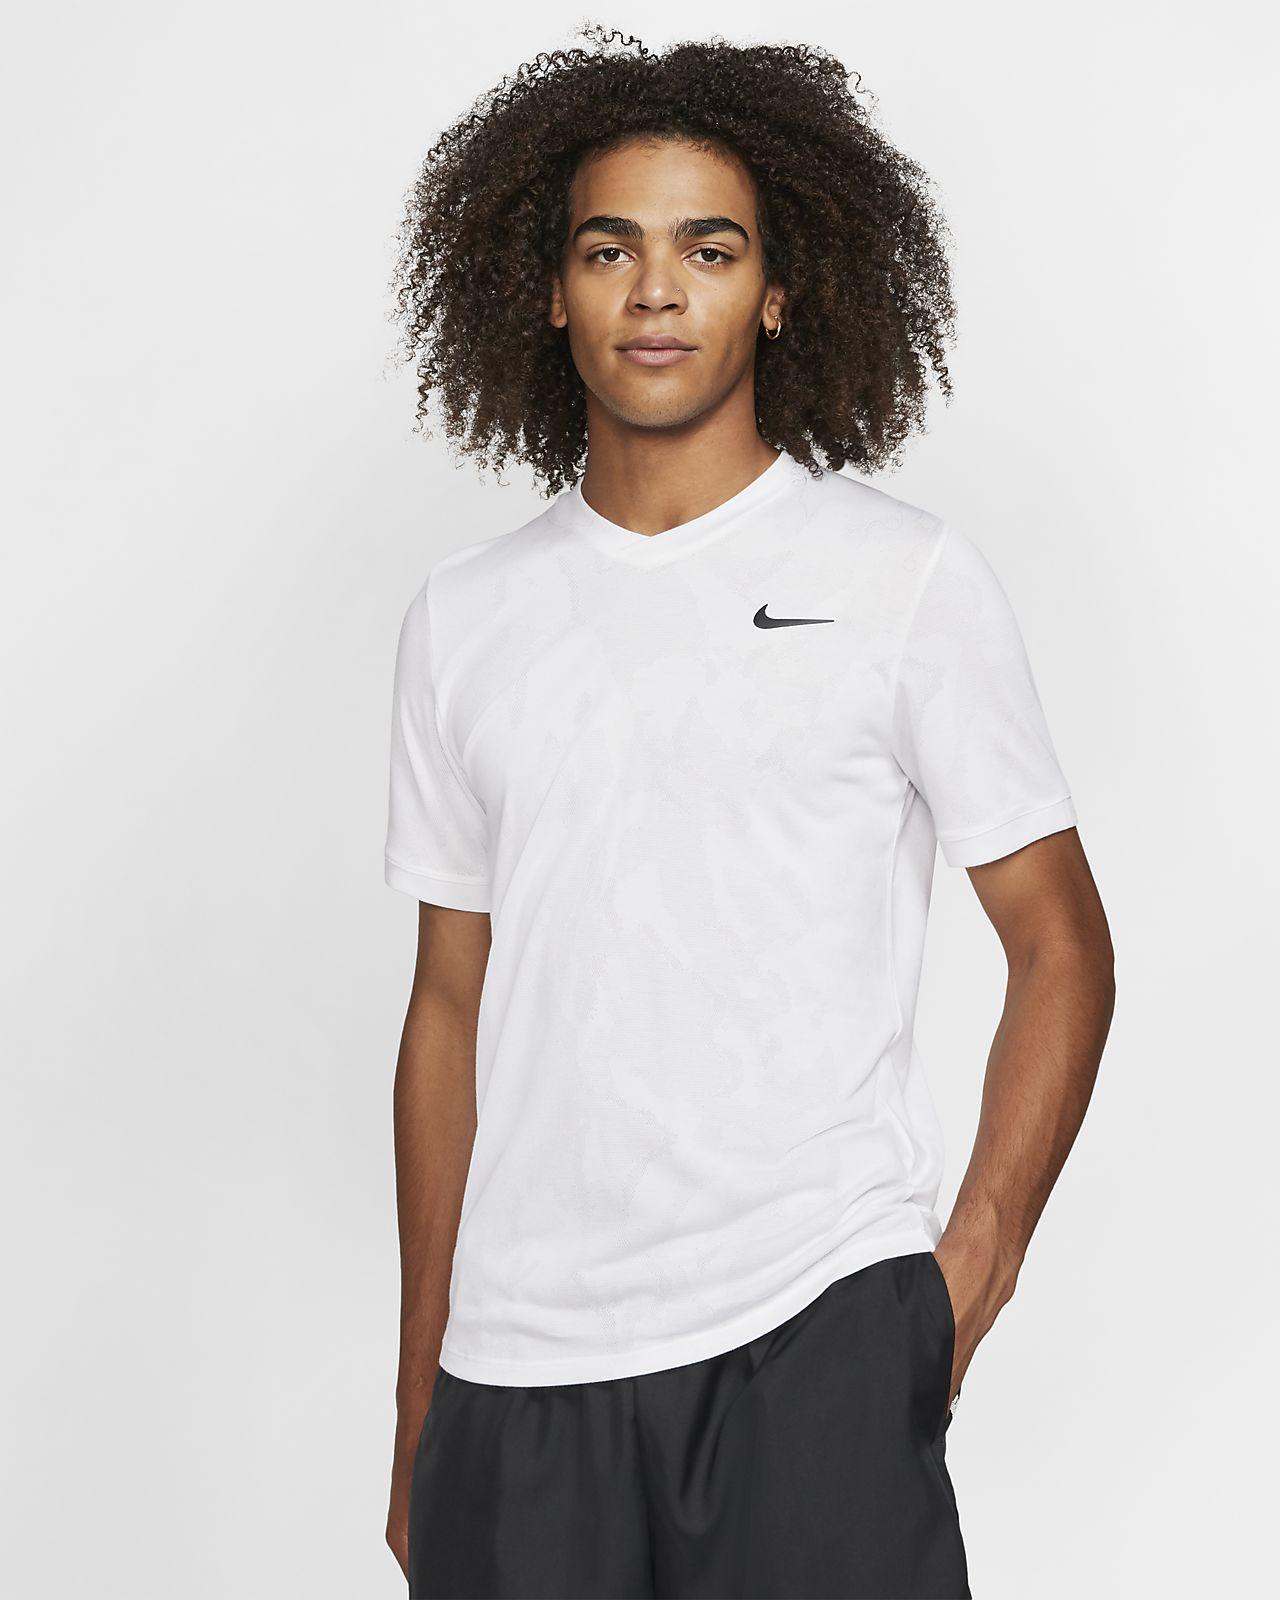 NikeCourt Dri FIT Challenger Men's Short Sleeve Tennis Top